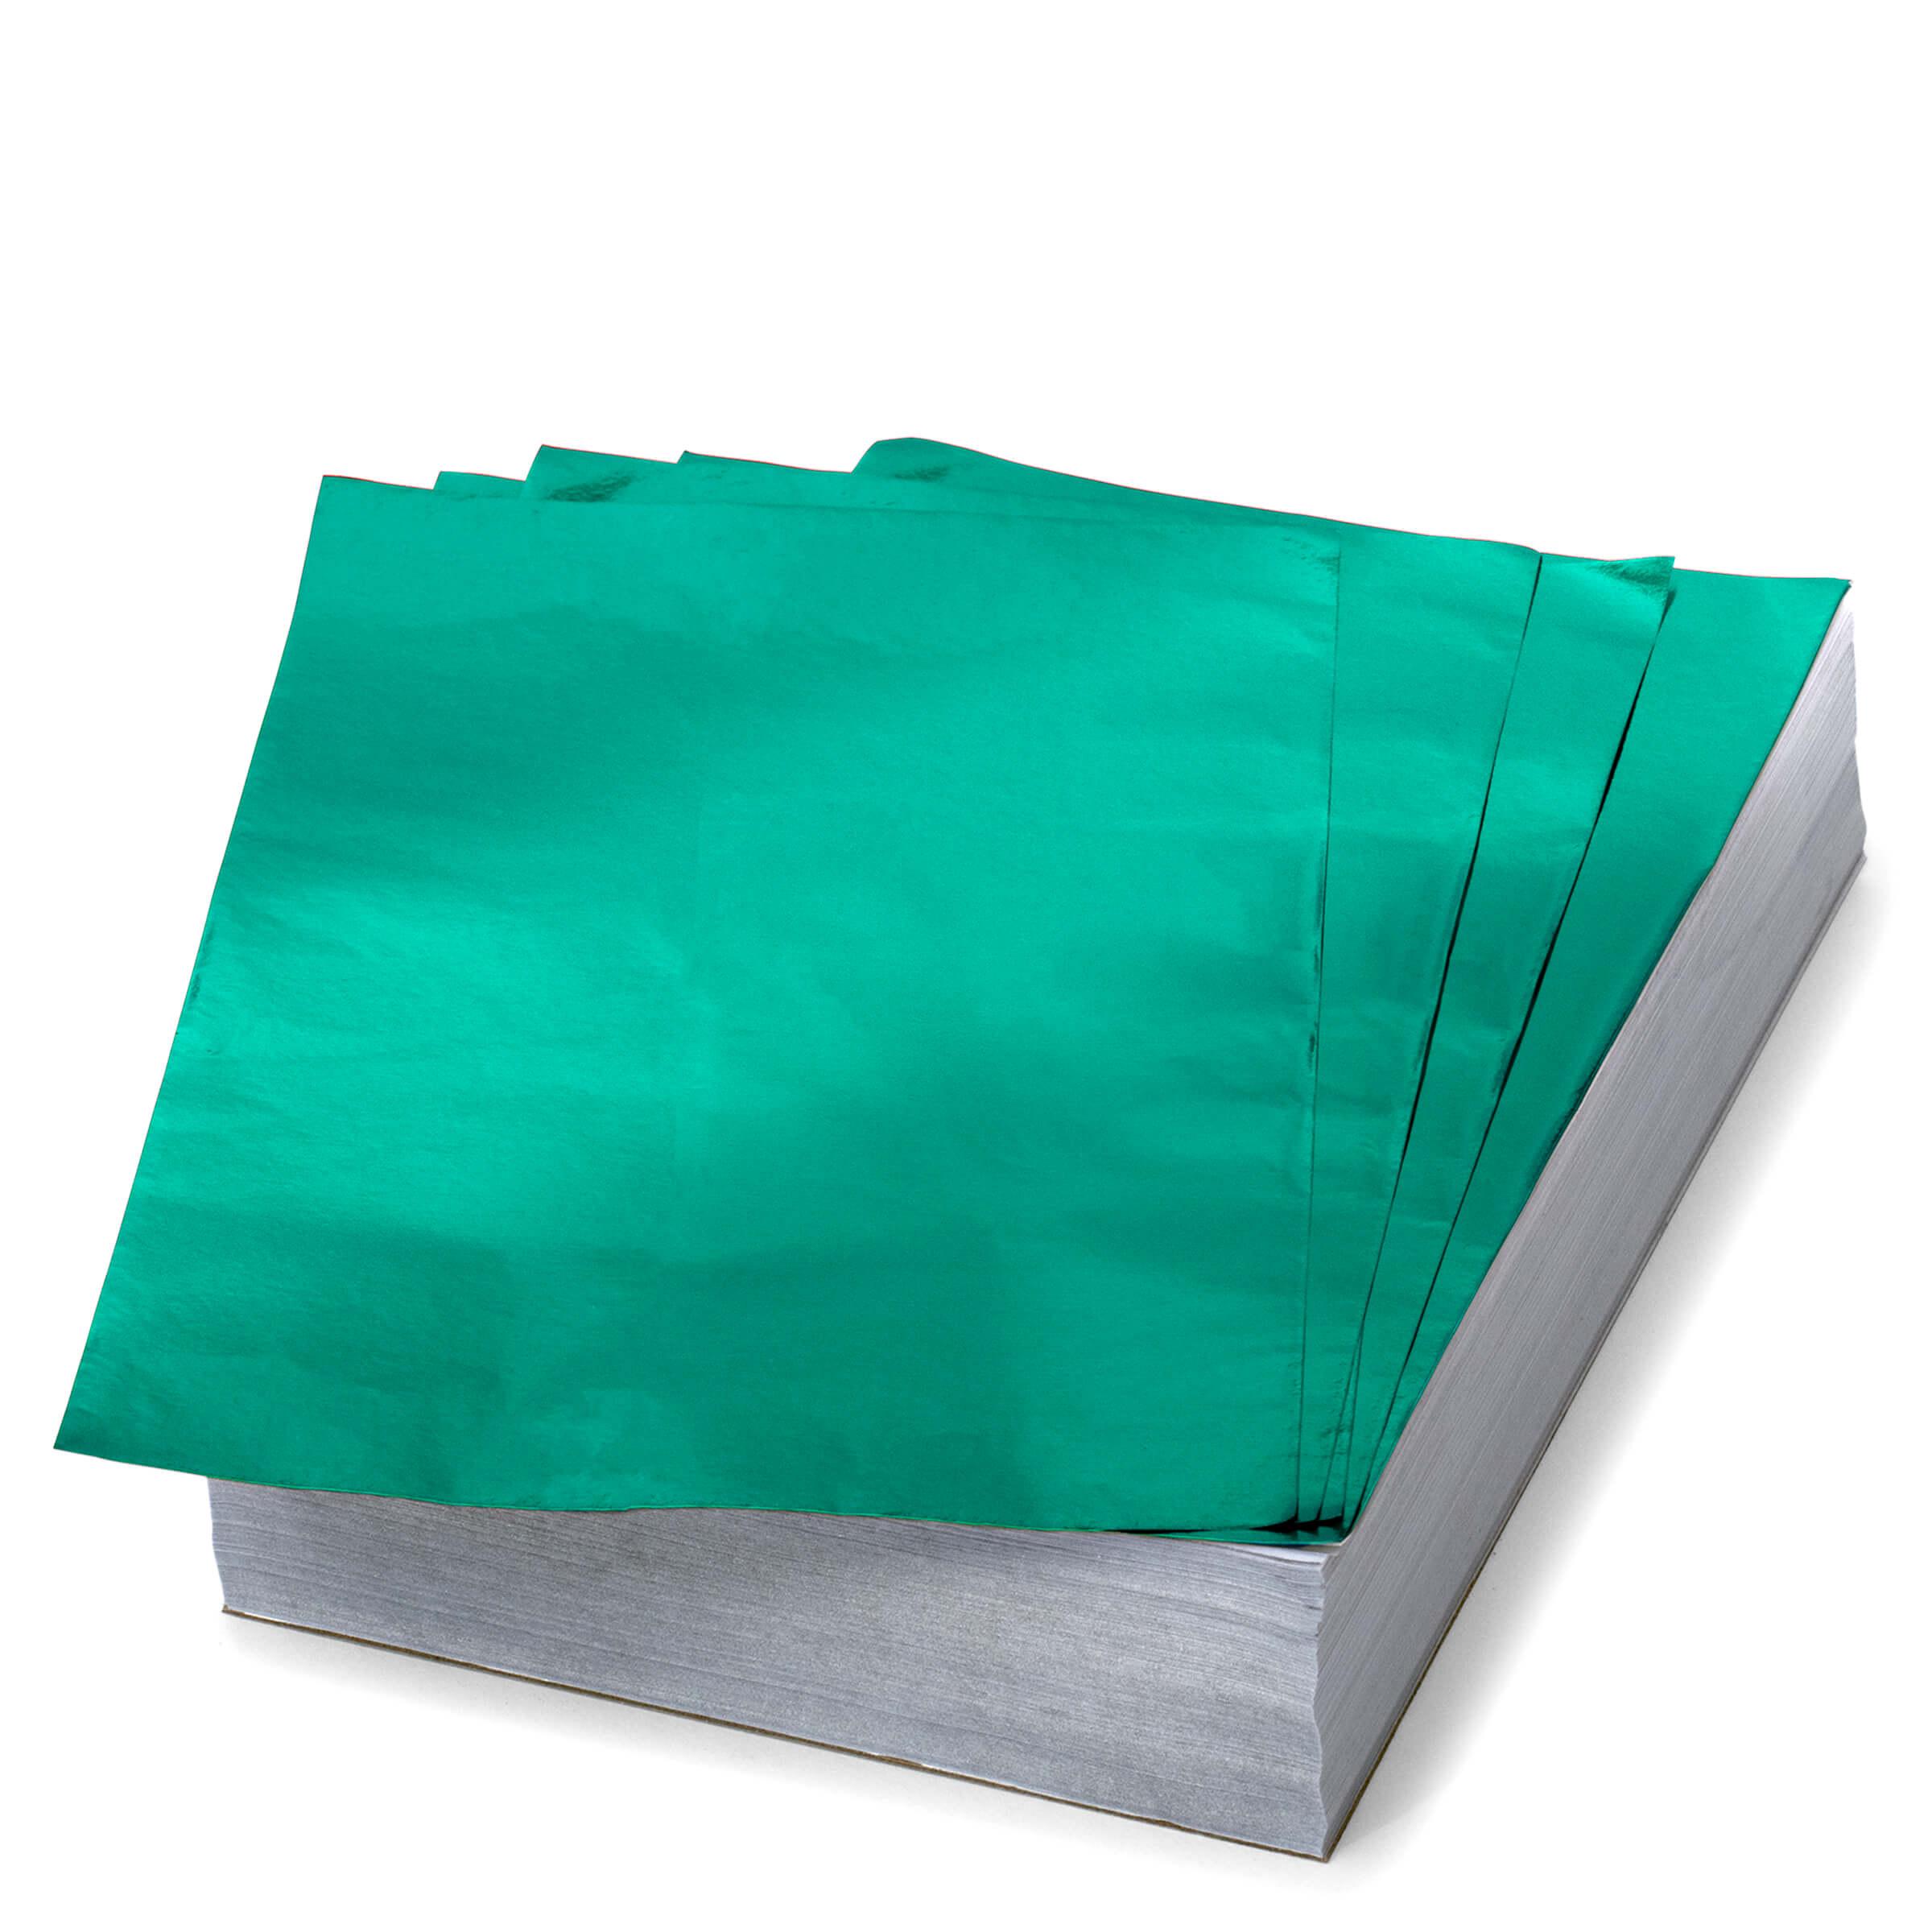 AL-58-45DU-a-5x8-smooth-foil-x-light-dull-green-l.jpg